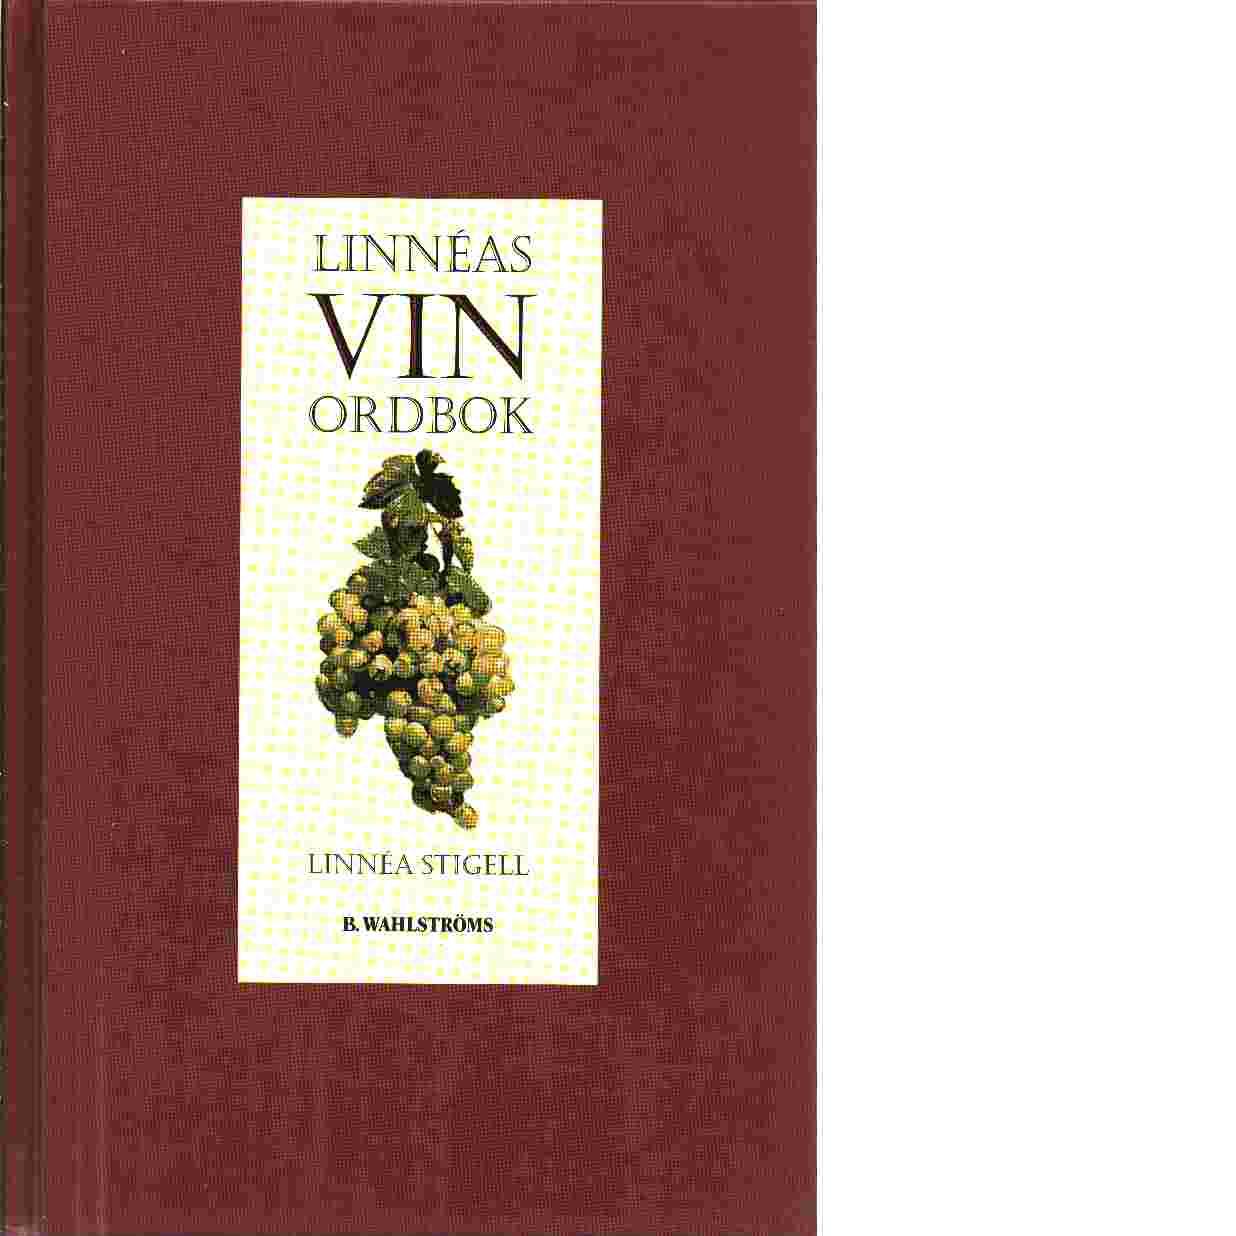 Linnéas vin ordbok - Stigell, Linnéa